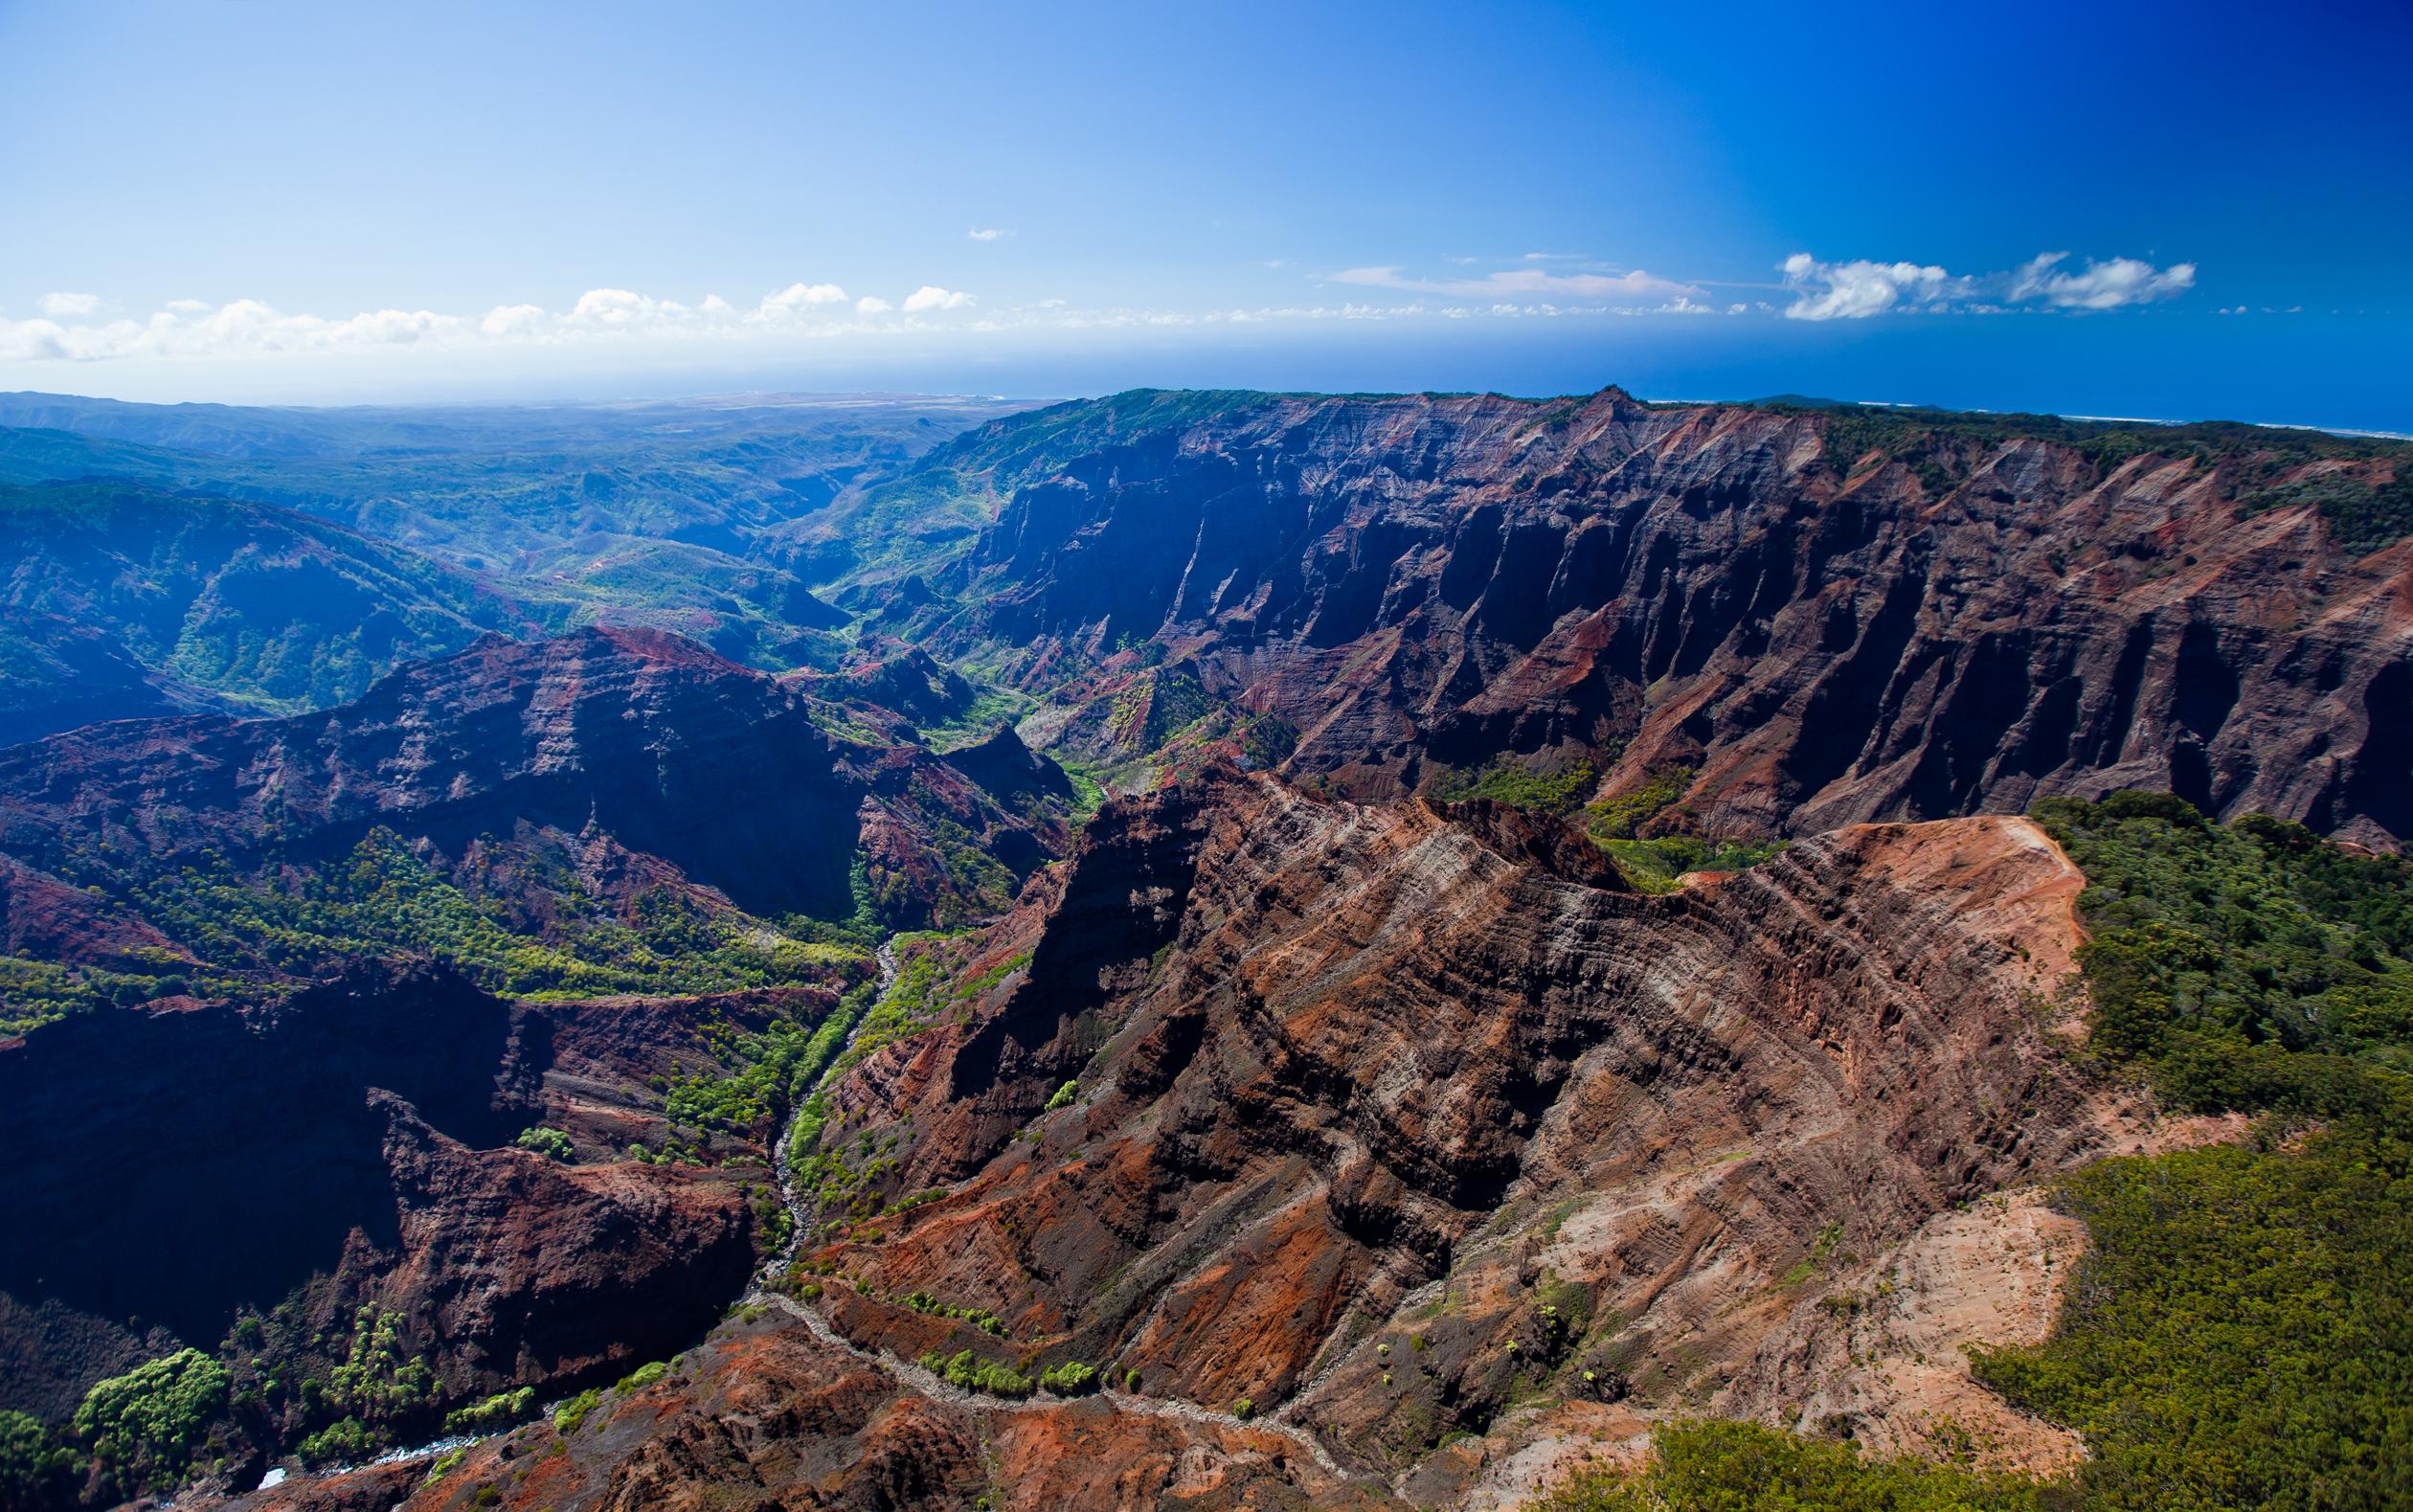 honeymooners guide hawaii waimea canyon tor johnson